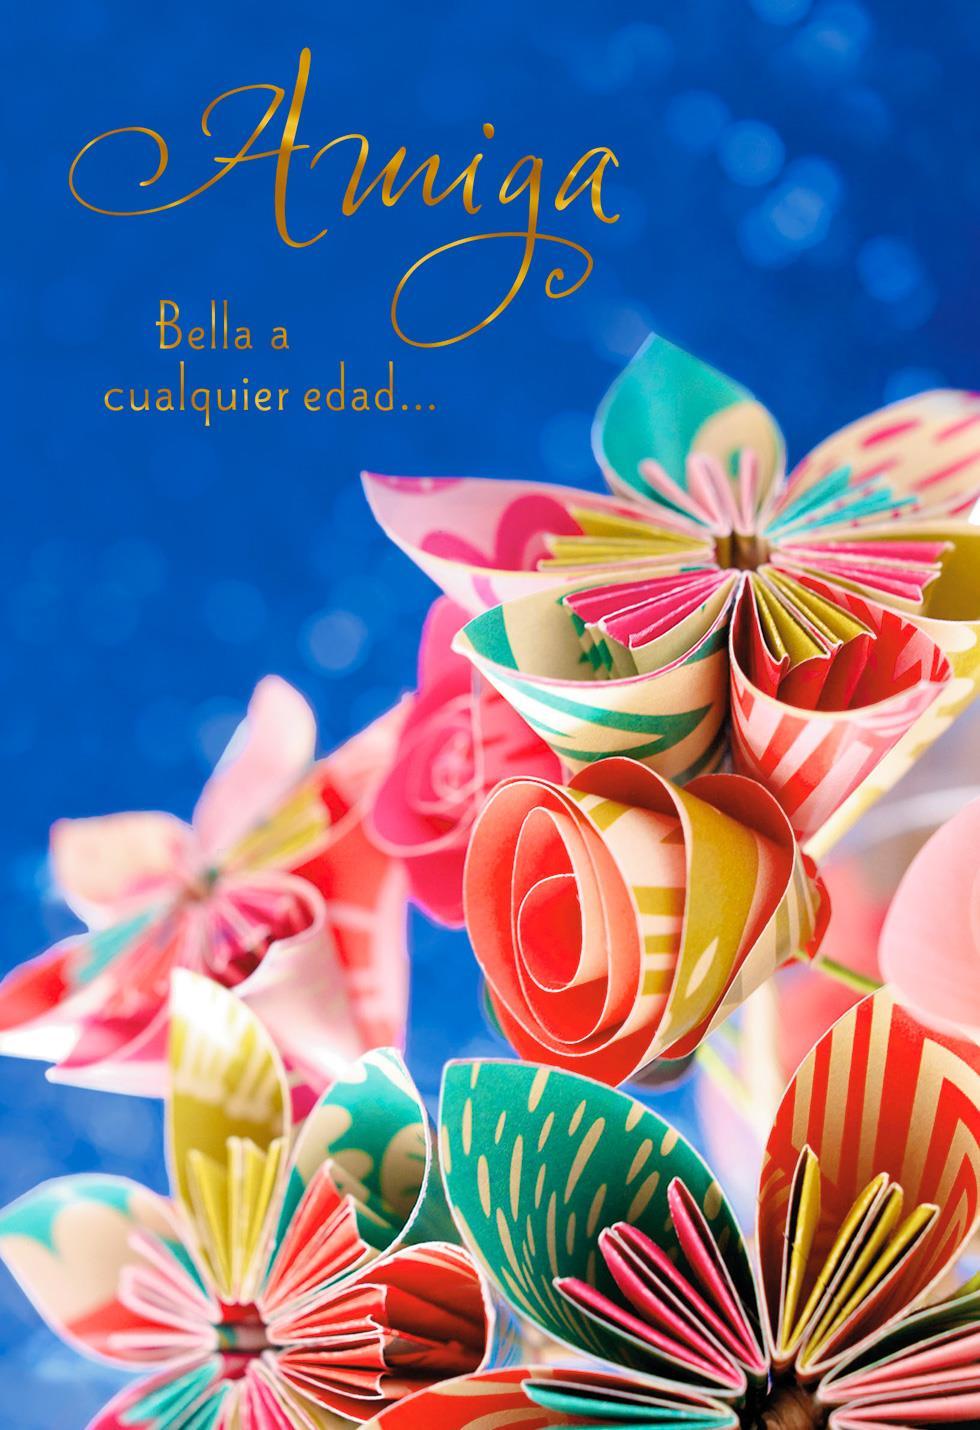 beautiful at any age spanishlanguage birthday card